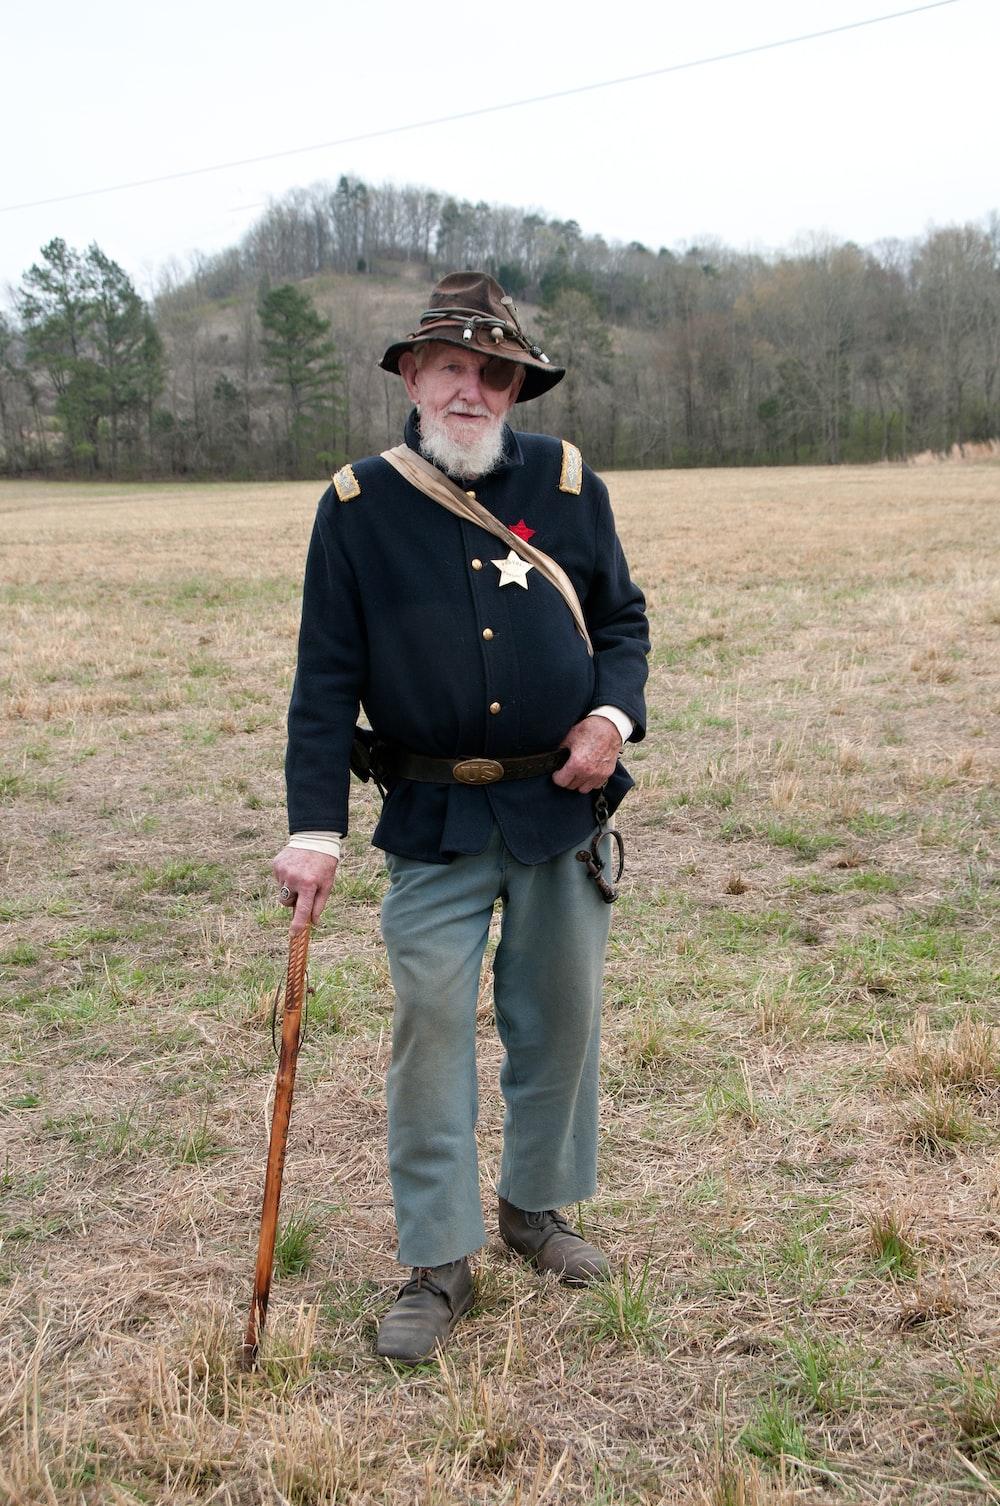 man in black coat standing on grass